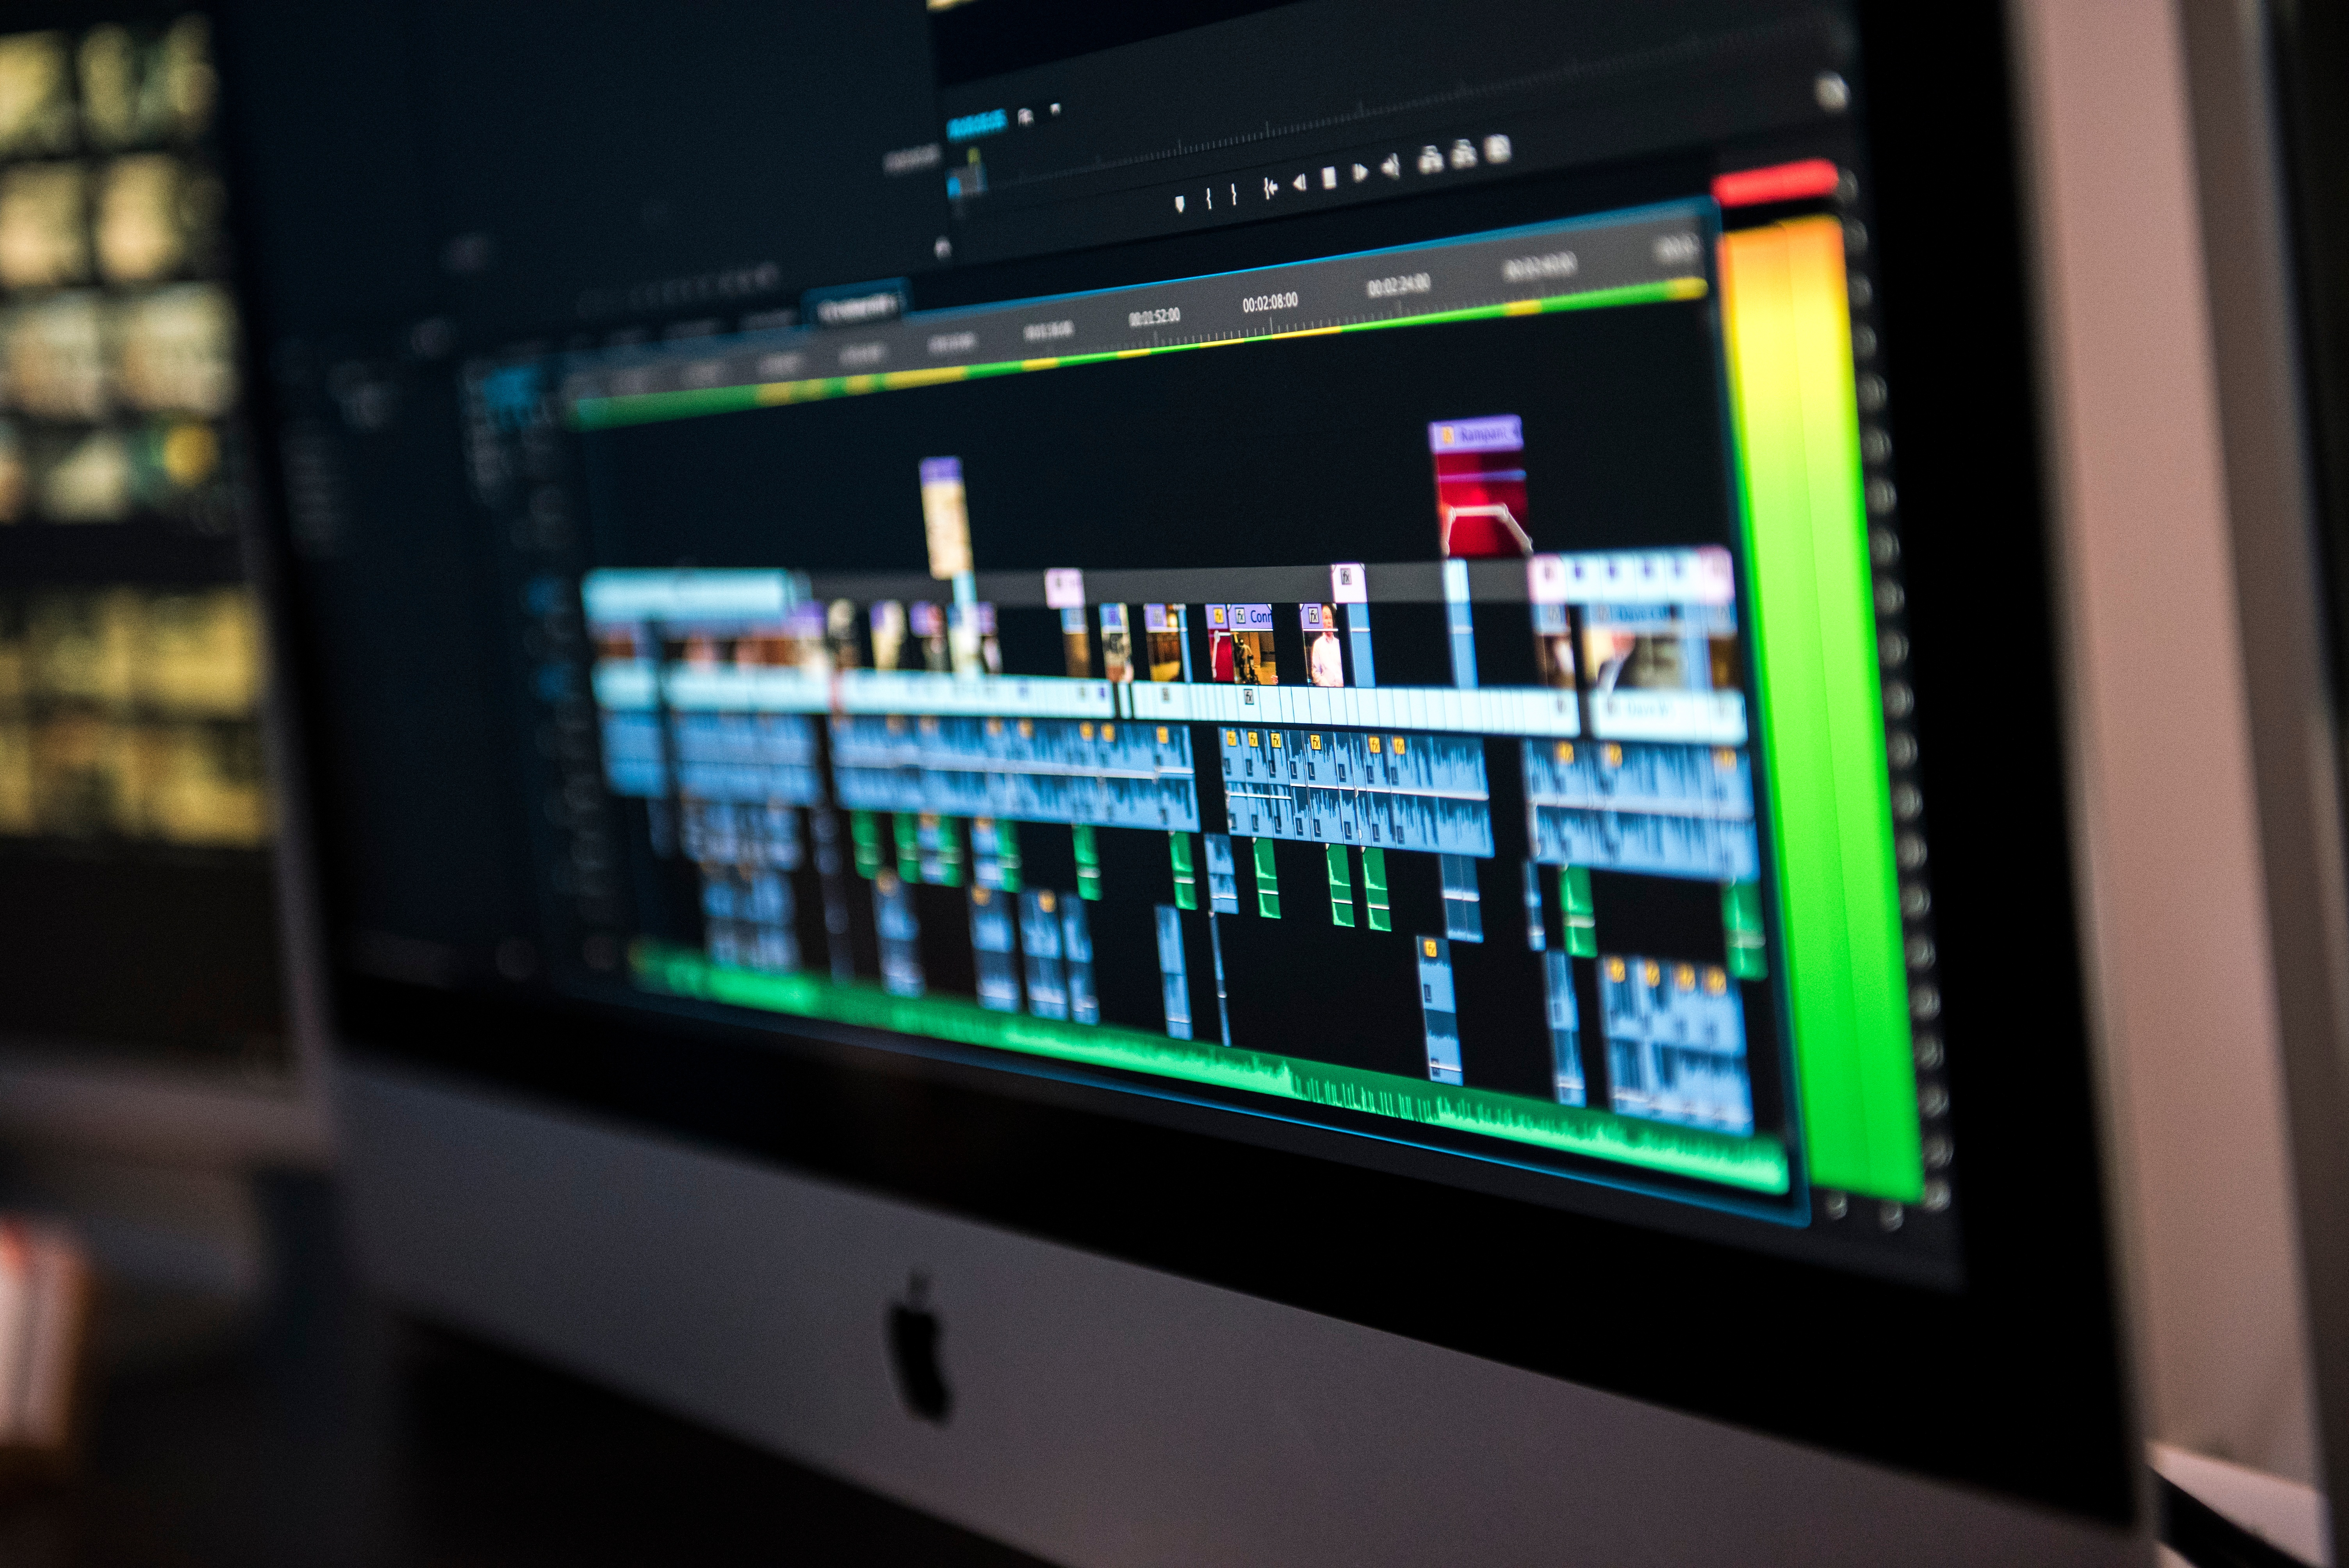 video-prod-04-1.jpg